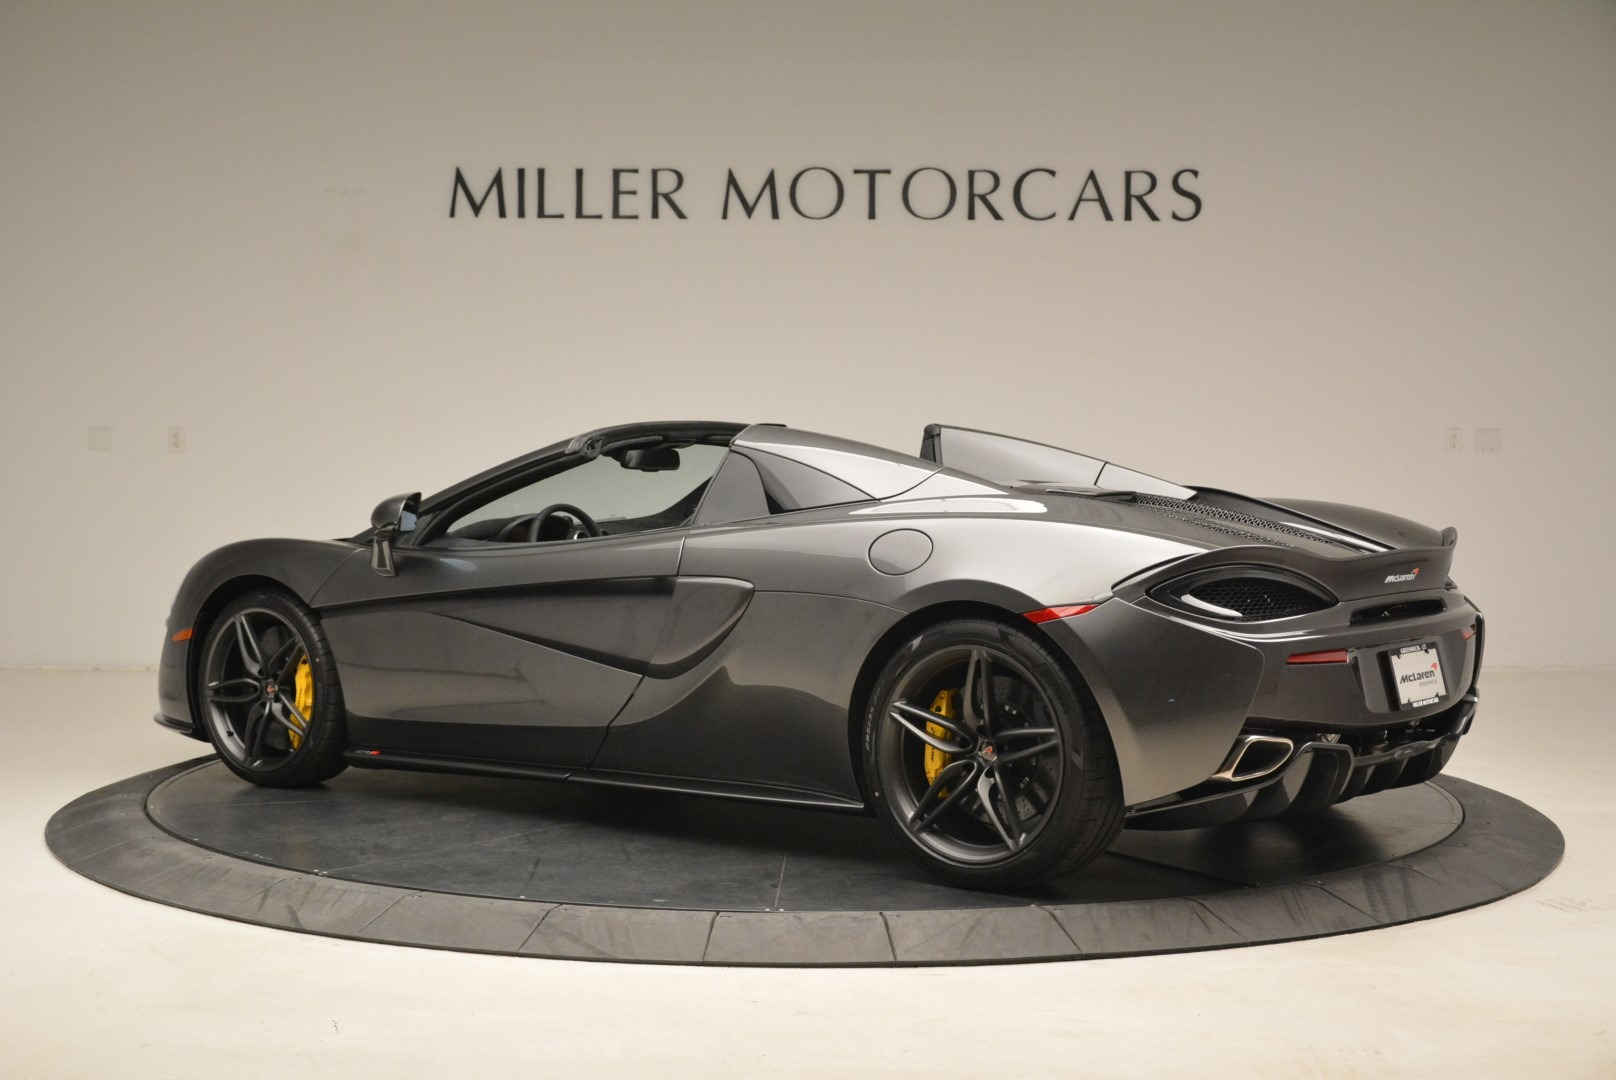 New 2018 McLaren 570S Spider For Sale In Greenwich, CT 2137_p4